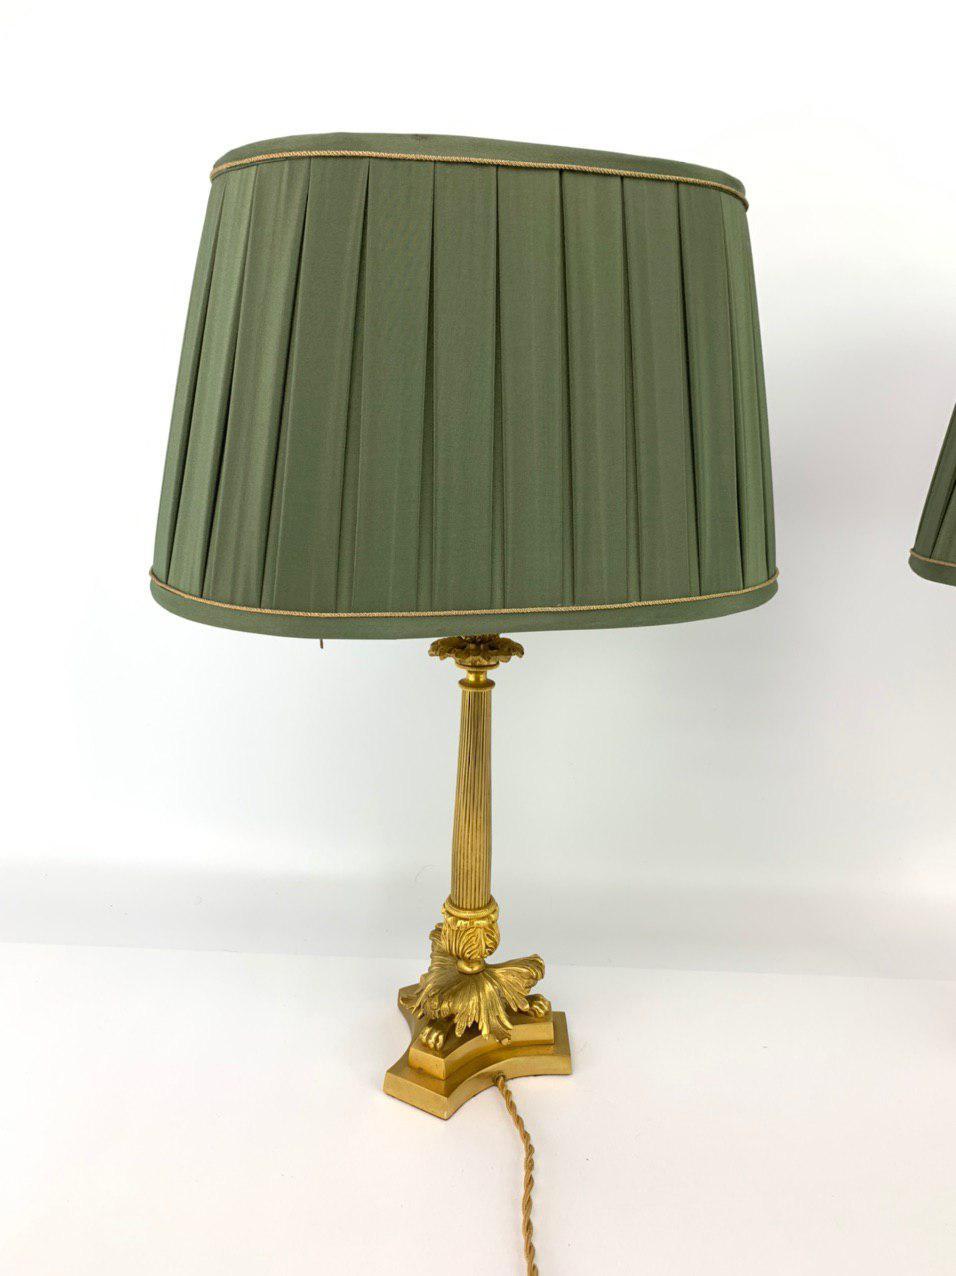 Антикварная пара светильников в стиле Ампир